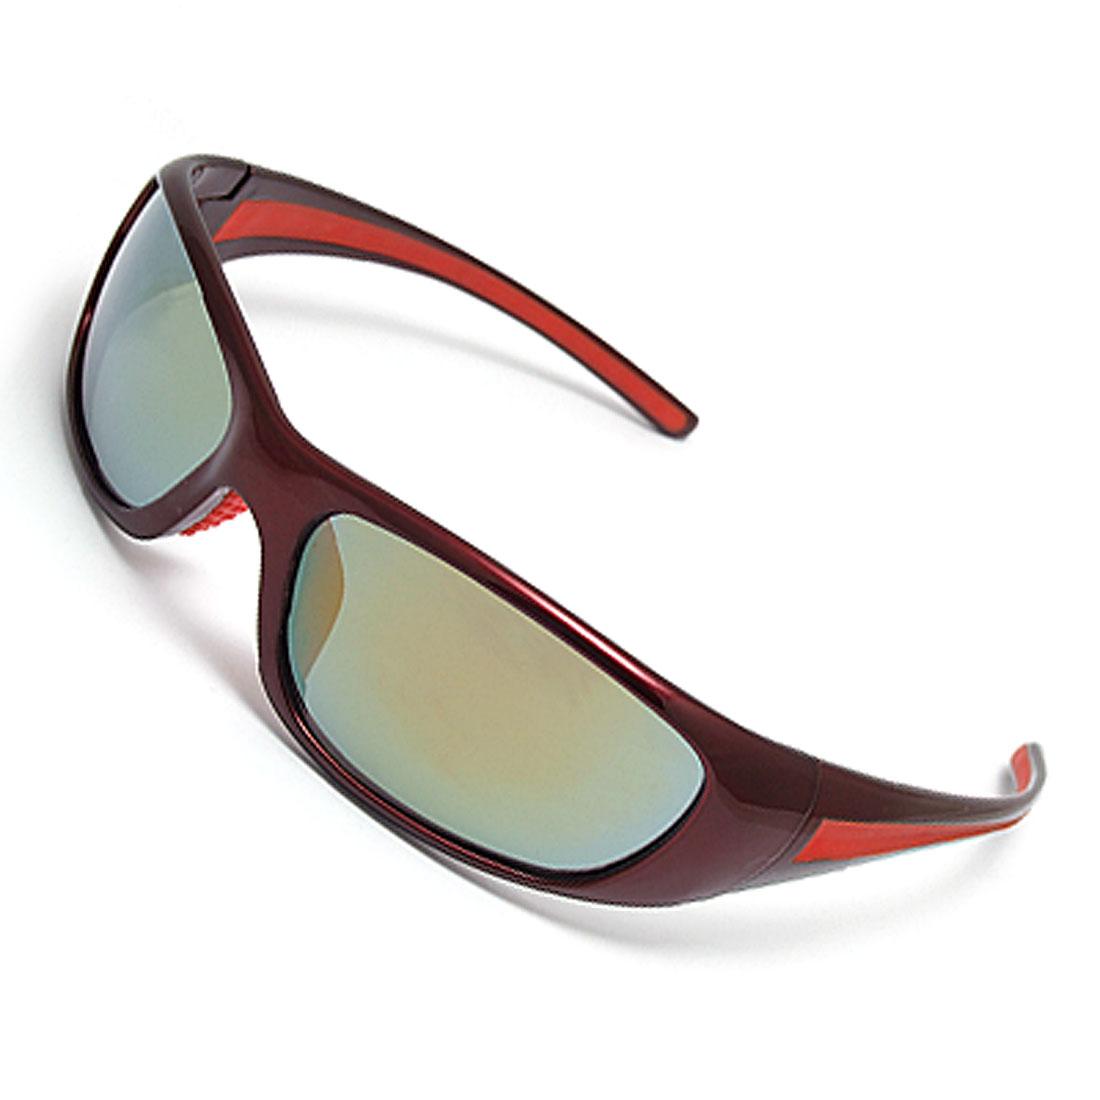 Claret Plastic Frame Unisex Eyeglasses Sunglasses